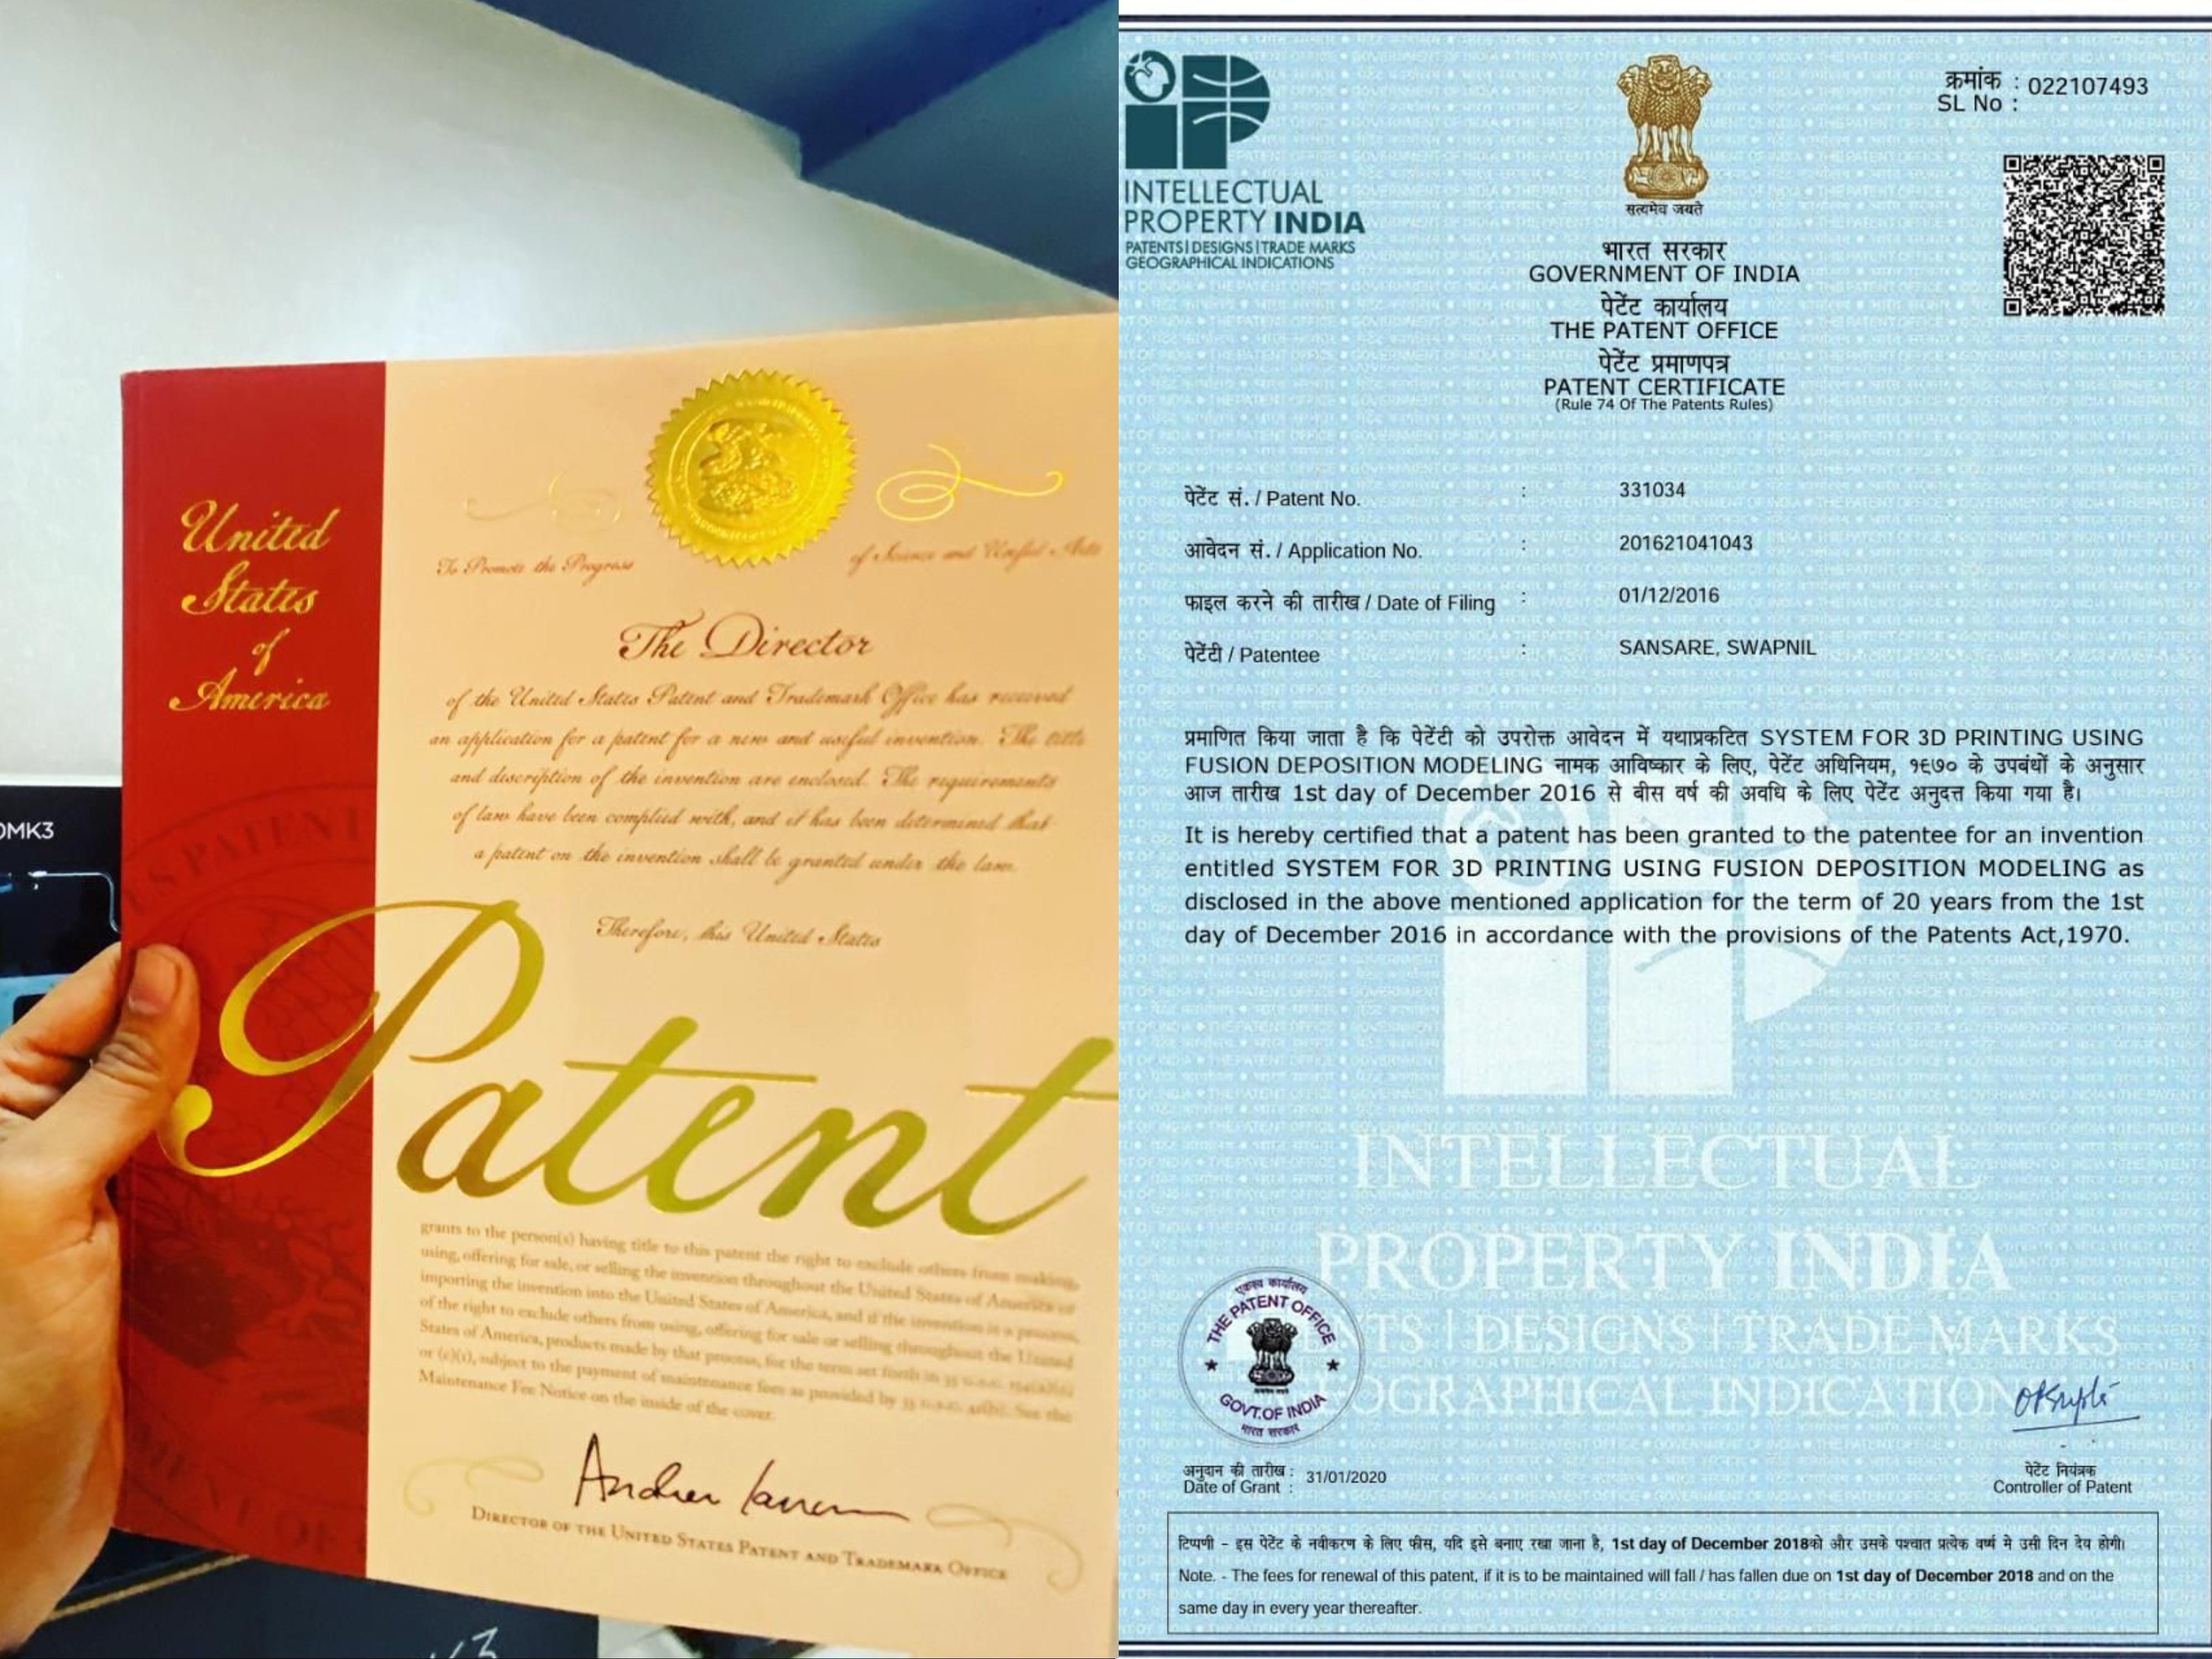 AFPM - Patent